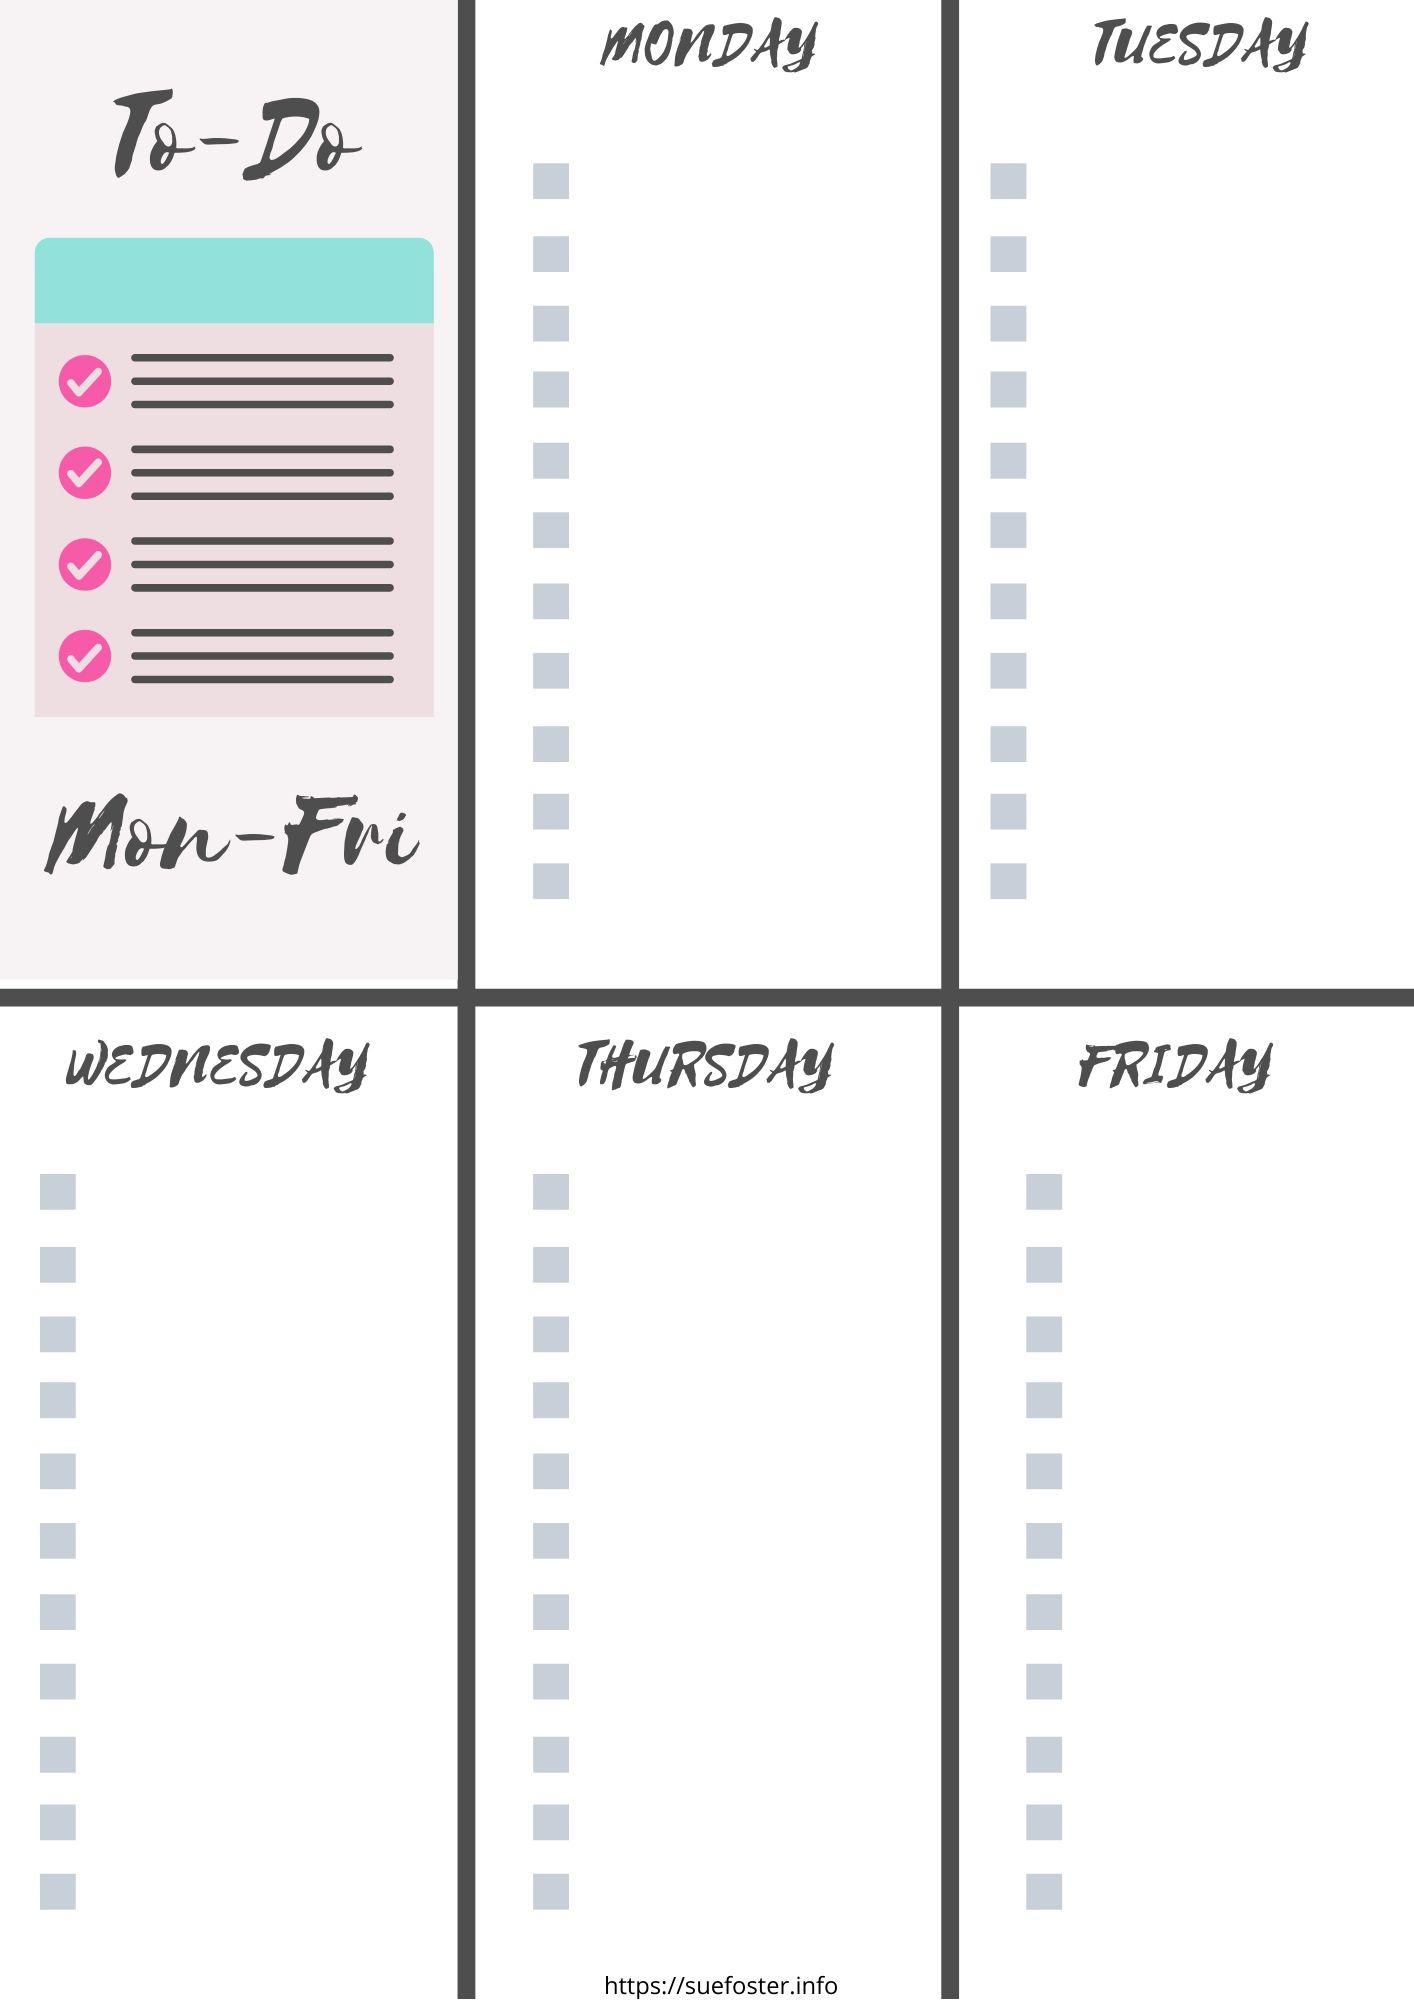 Printable To-Do List, Mon-Fri.